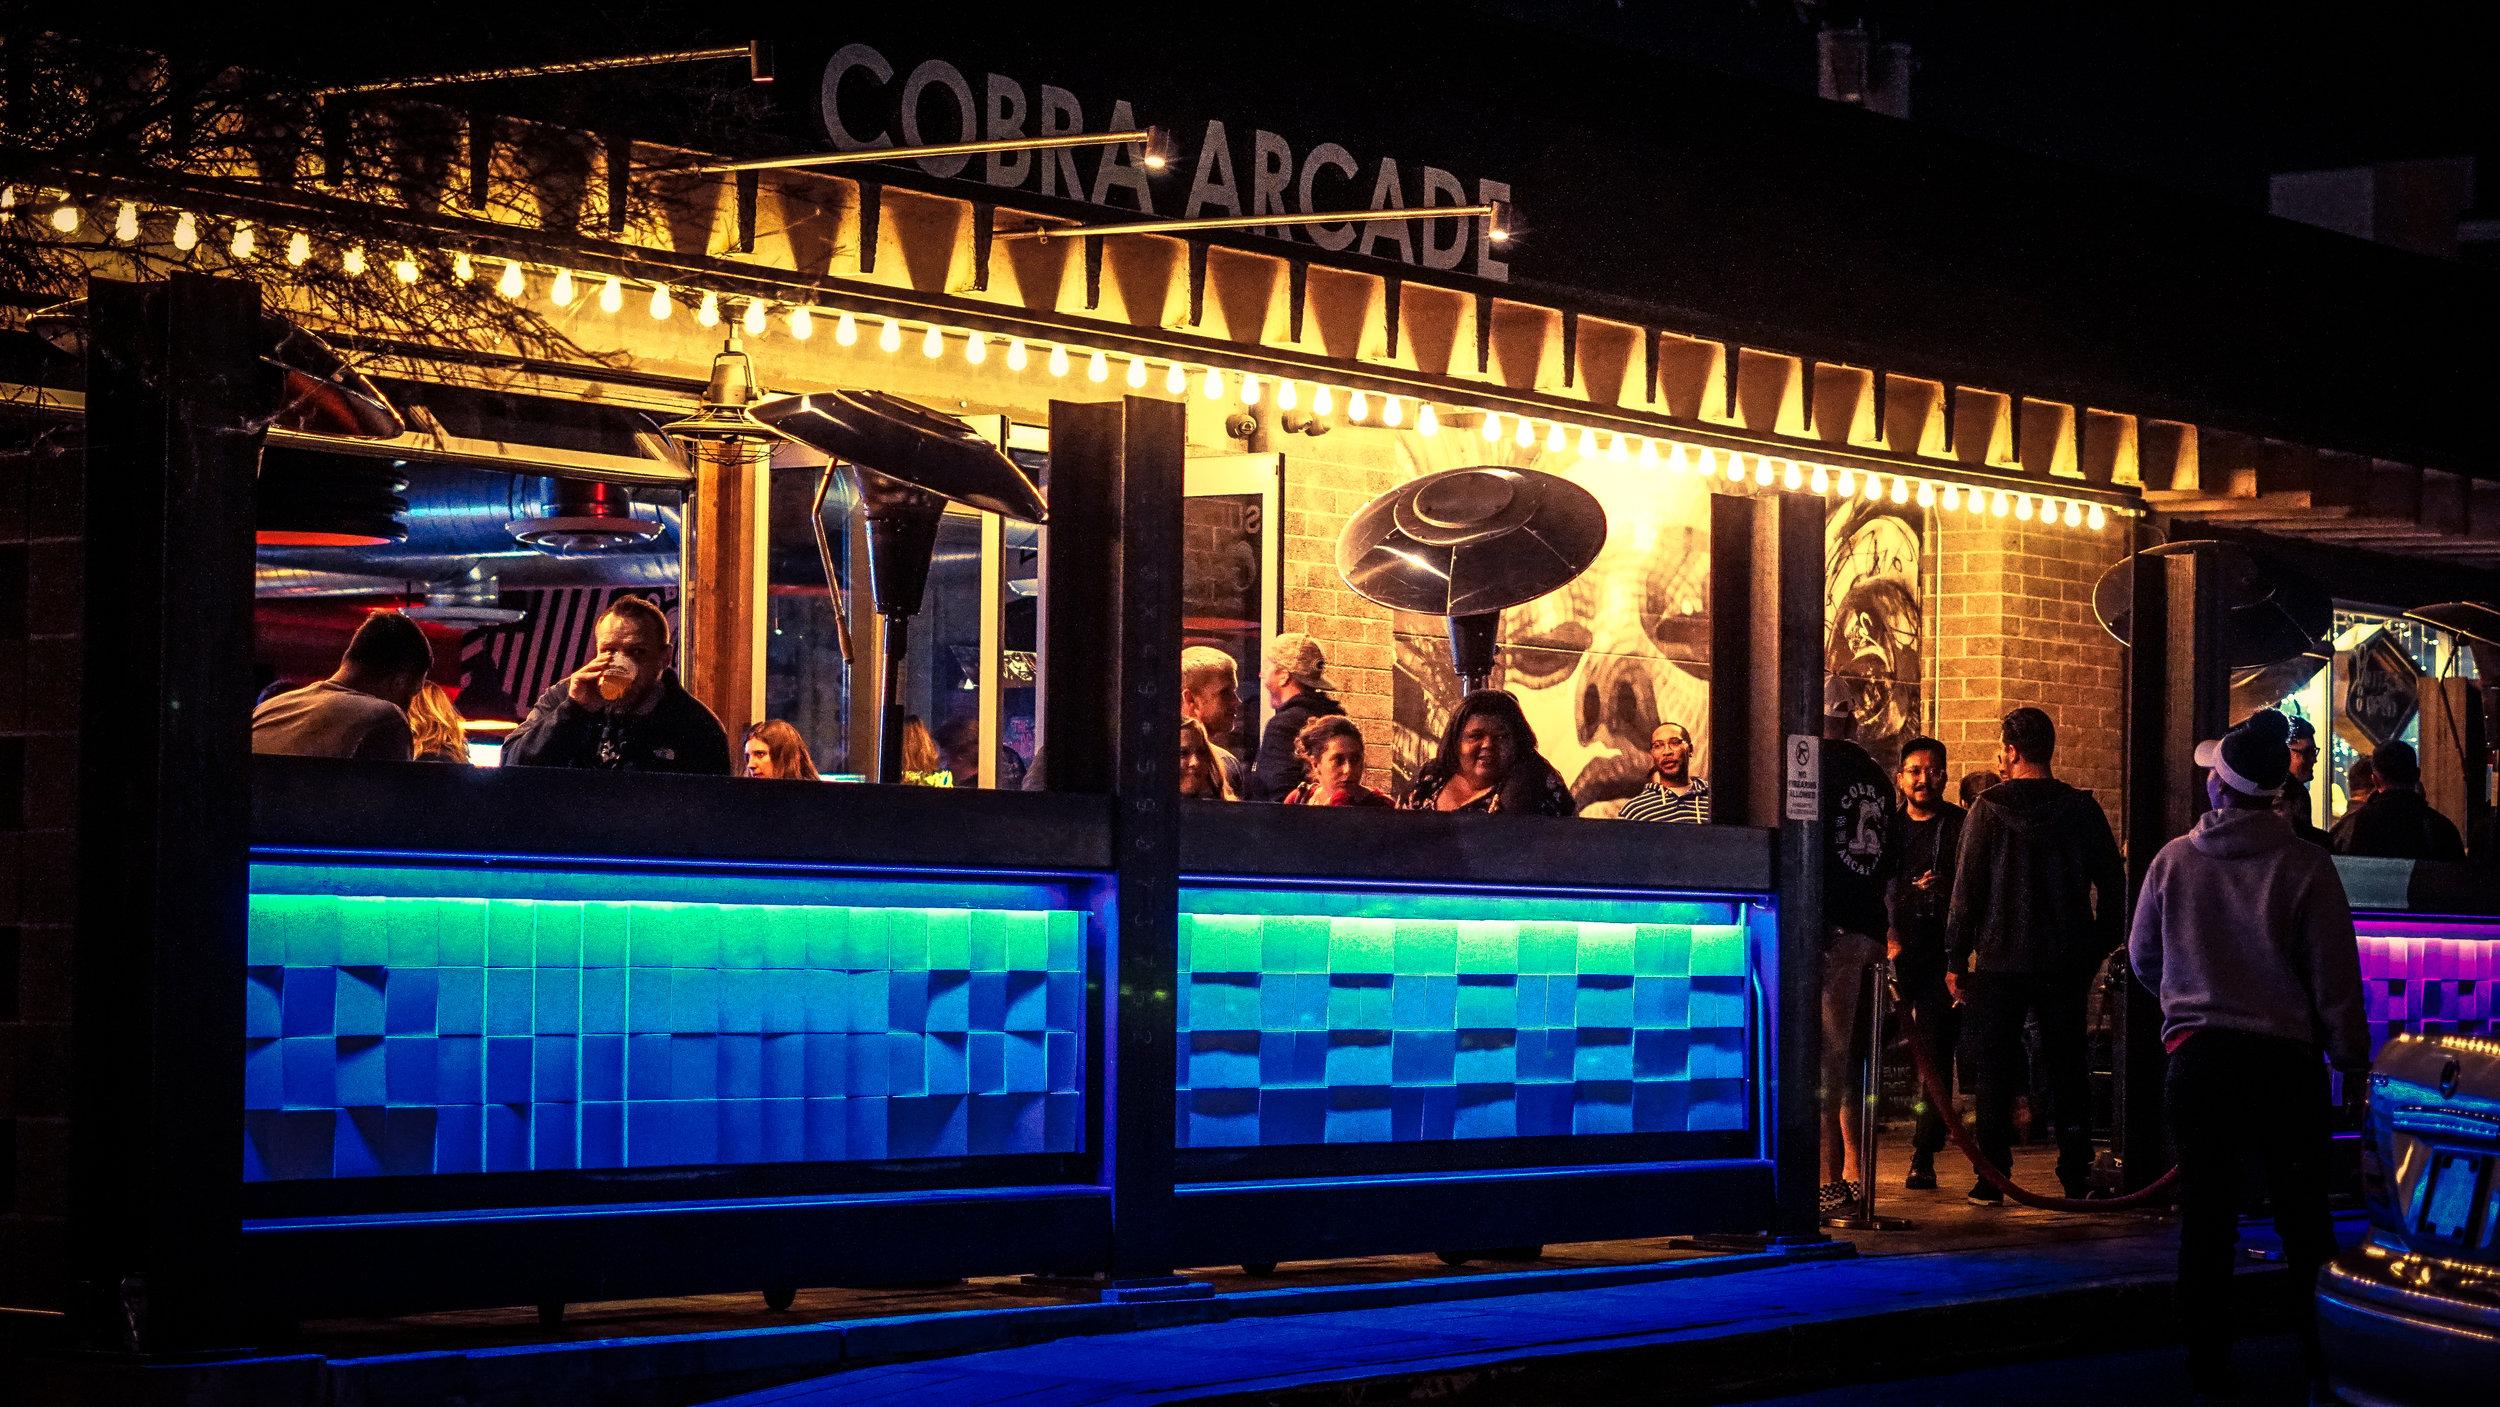 Cobra Arcade Bar - Local stop #2